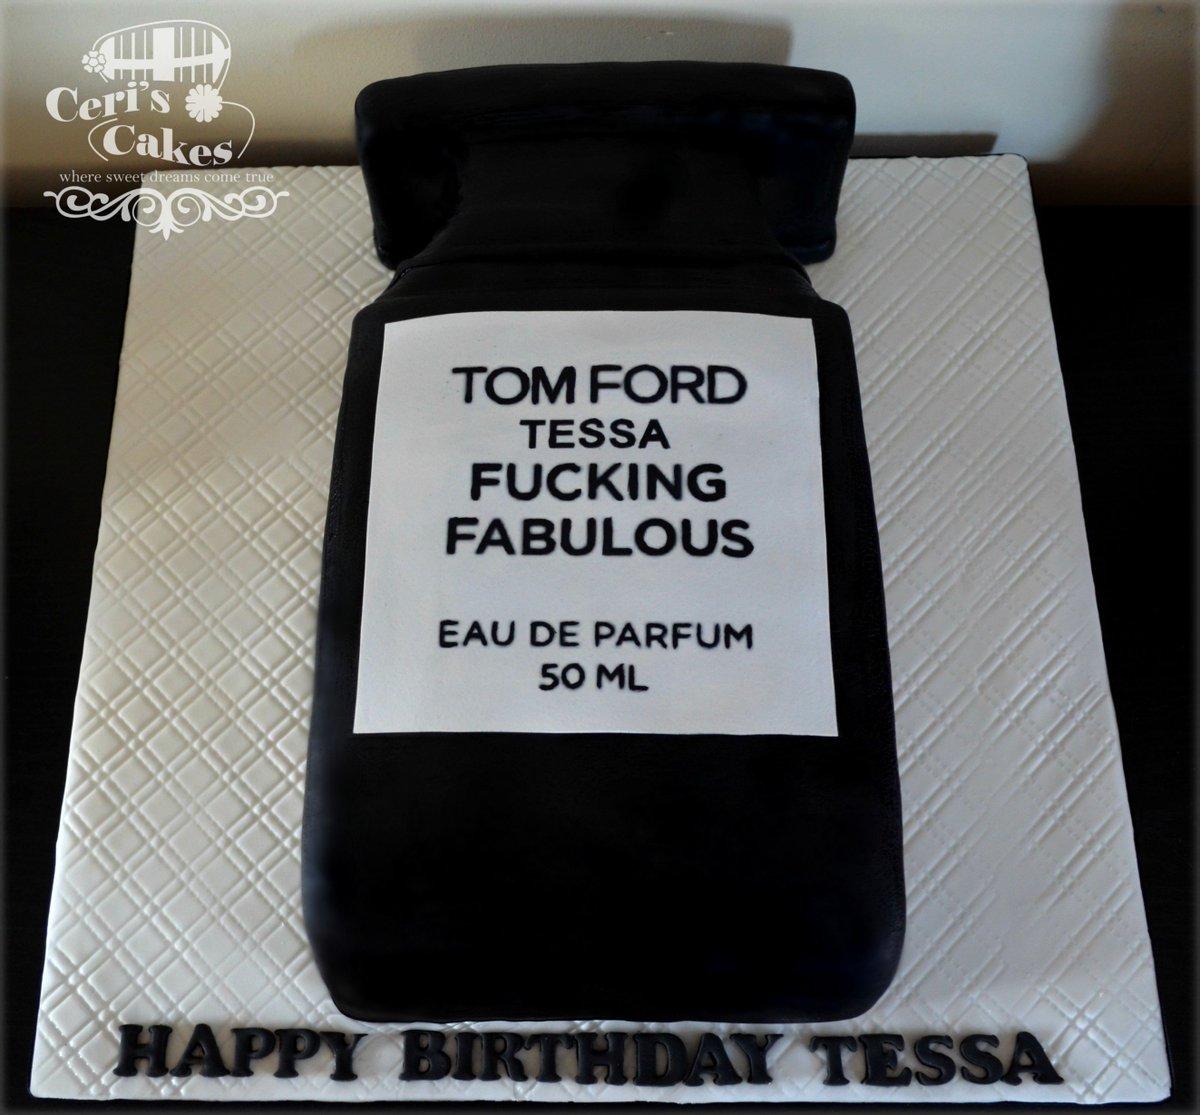 Ceris Cakes On Twitter Tom Fords Fucking Fabulous Perfume Cake